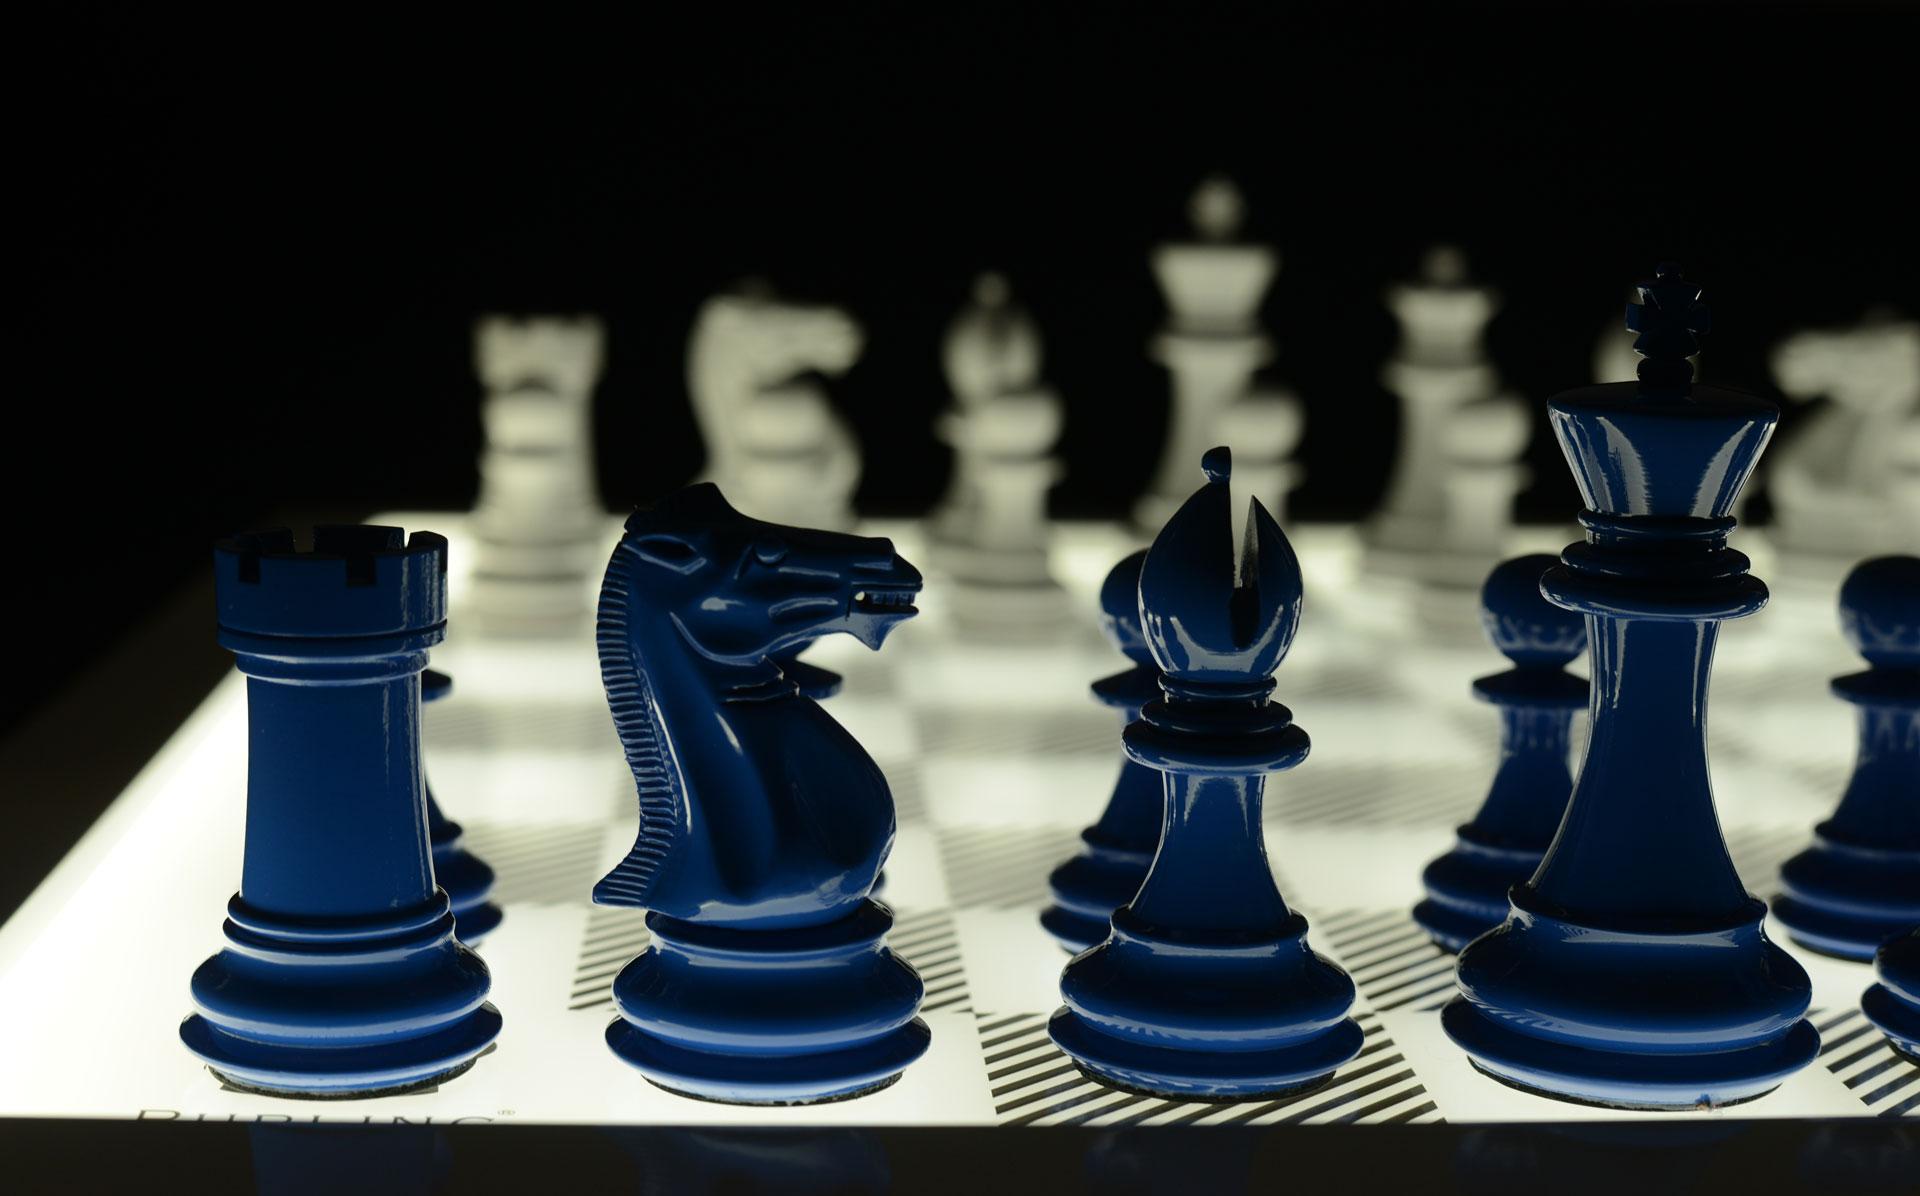 Dark Chess Set Pooltables Ch